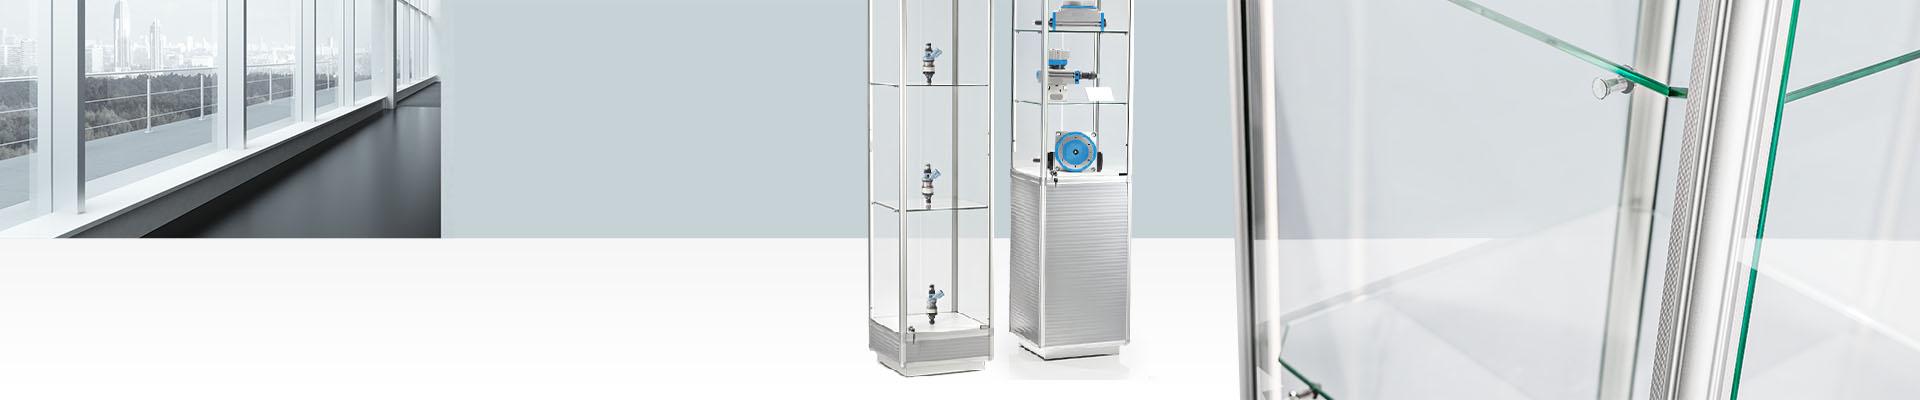 vitrinen im faisst shop kaufen faisst koffershop. Black Bedroom Furniture Sets. Home Design Ideas